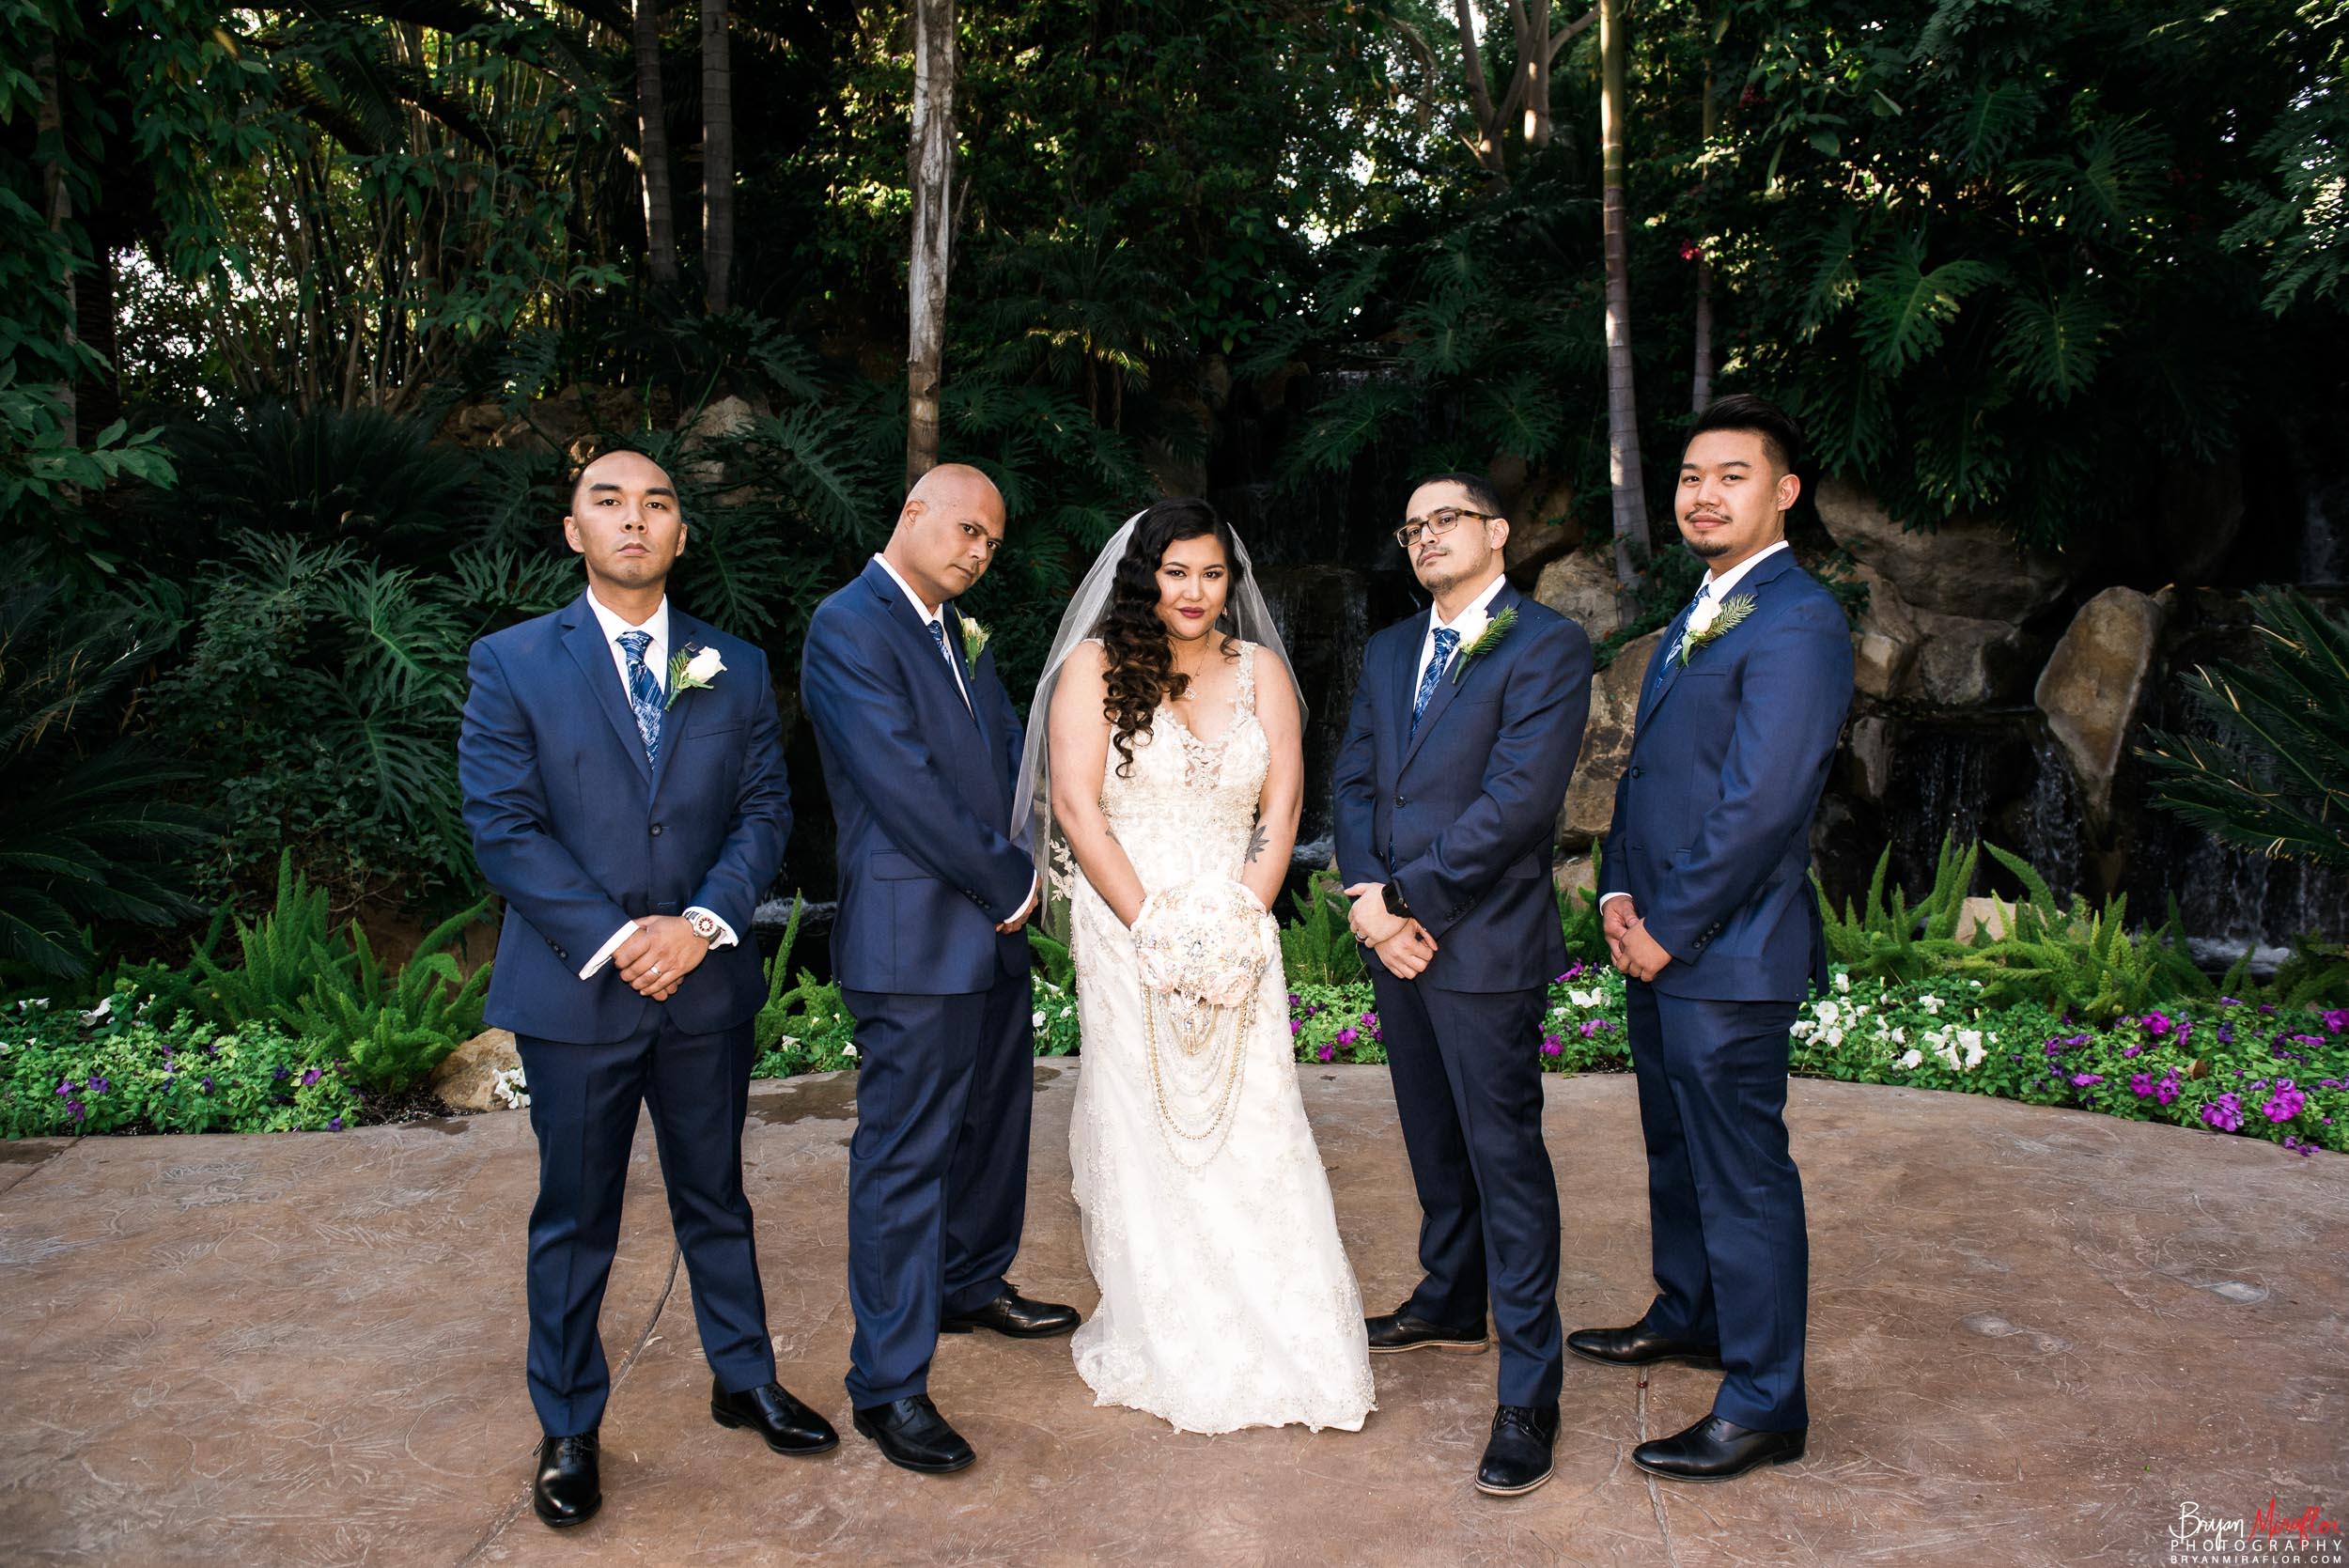 Bryan-Miraflor-Photography-Hannah-Jonathan-Married-Grand-Traditions-Estate-Gardens-Fallbrook-20171222-140.jpg